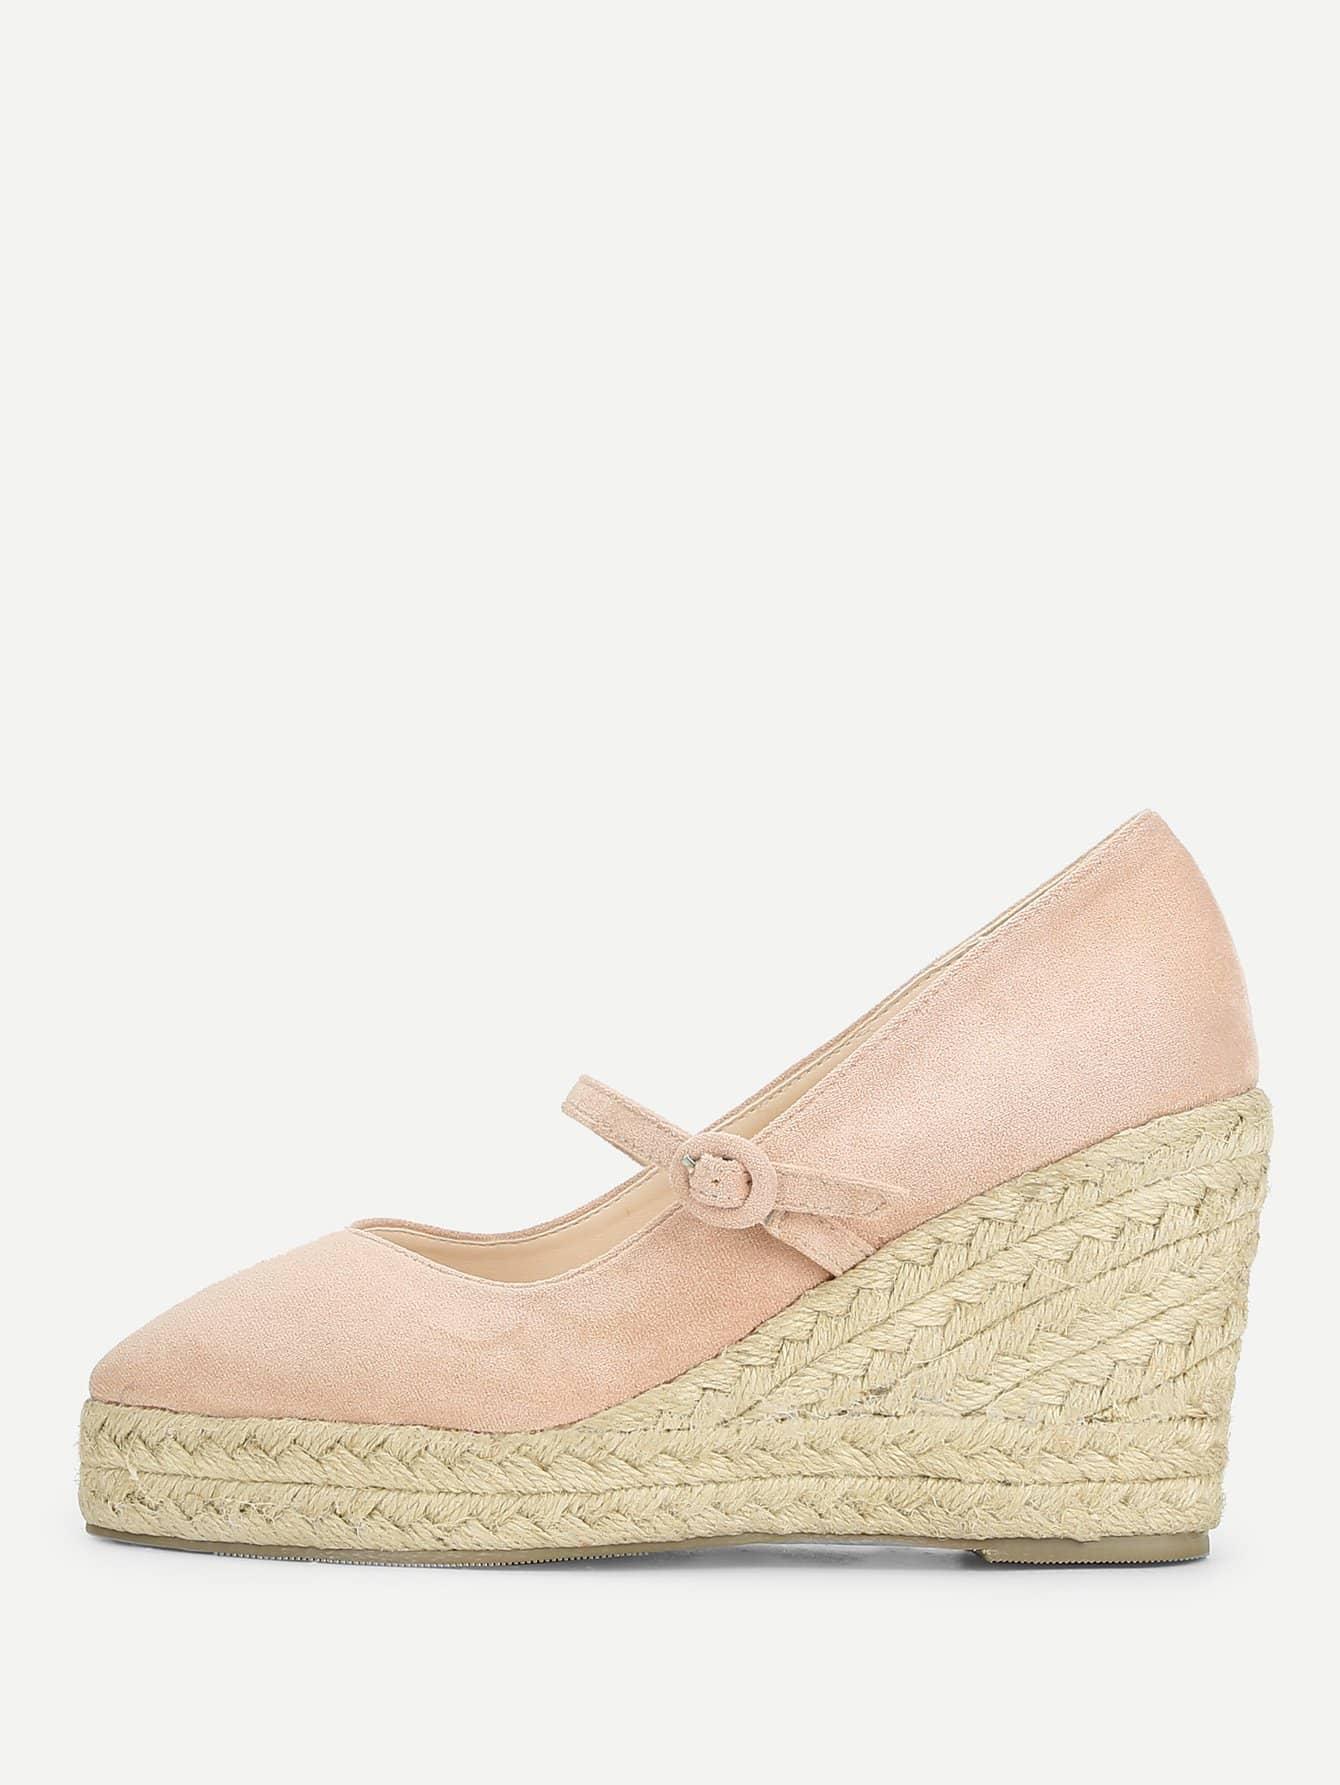 Купить Mary Jane Туфли на танкетке, null, SheIn